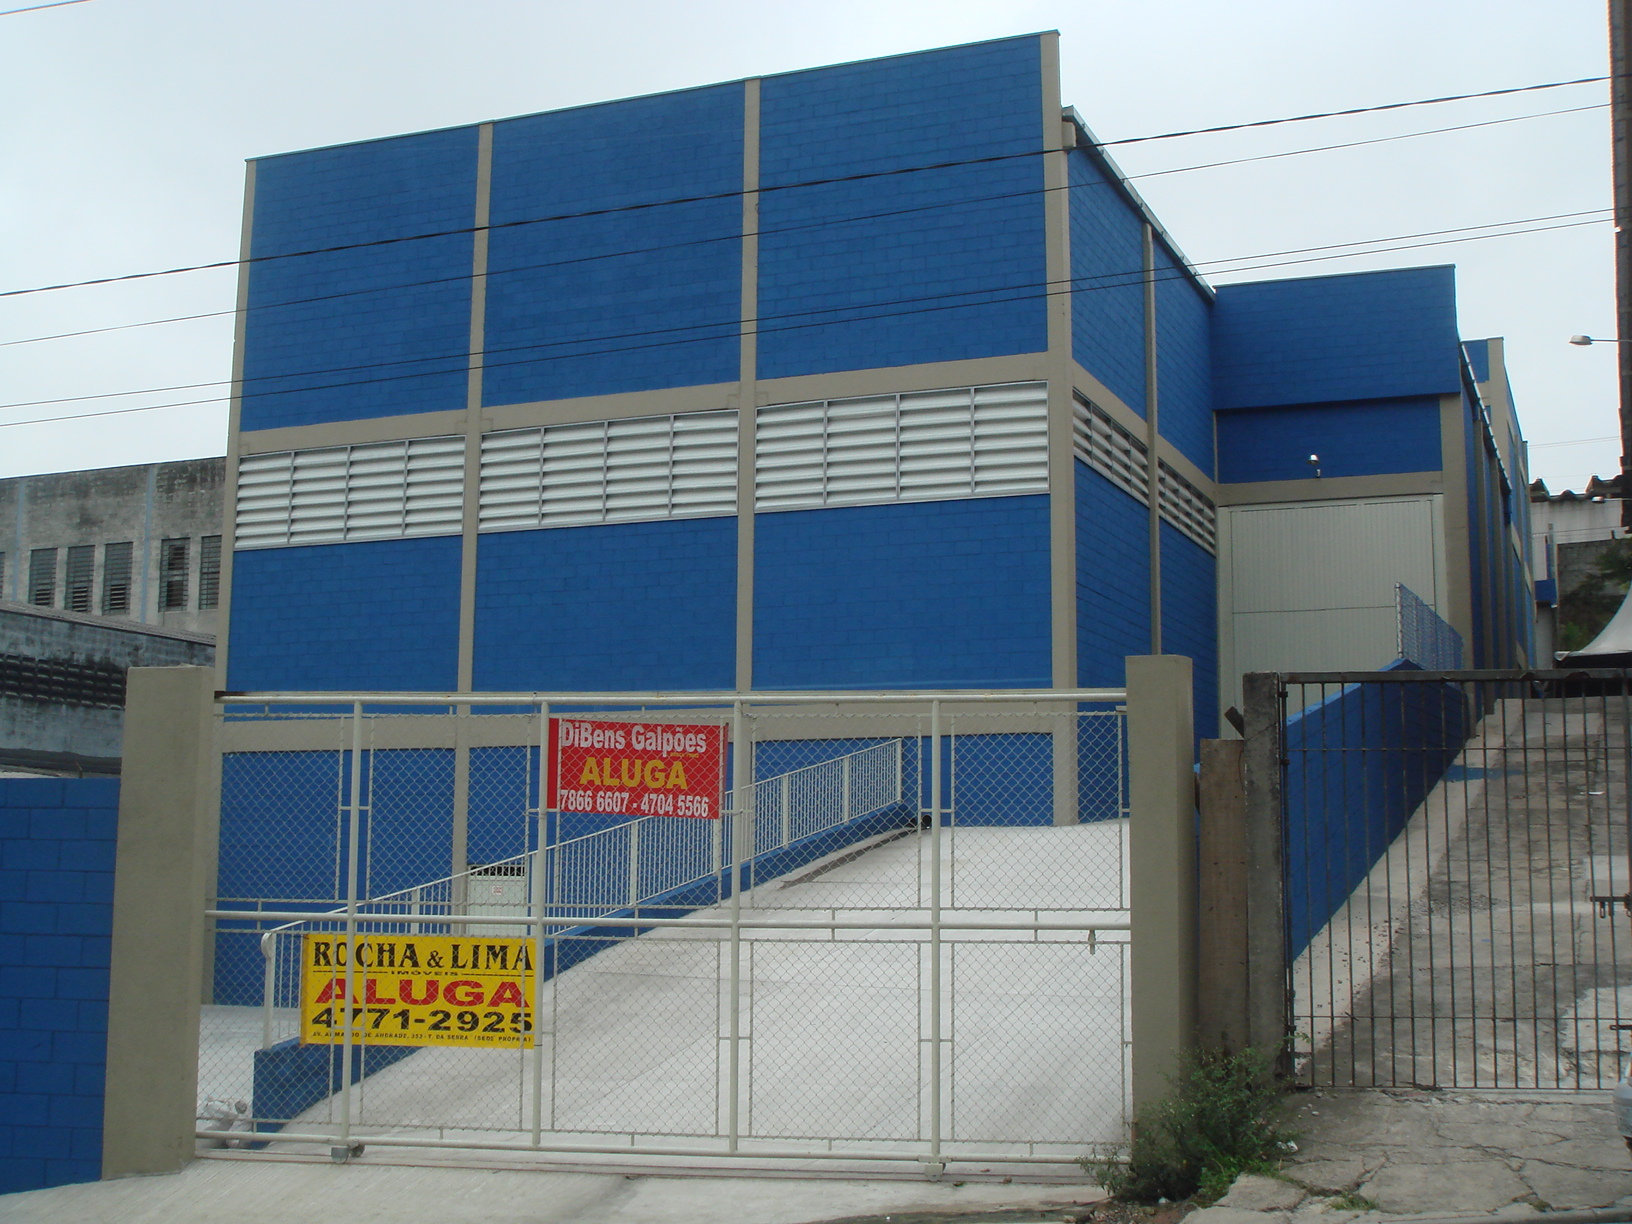 Galpao Industrial.JPG